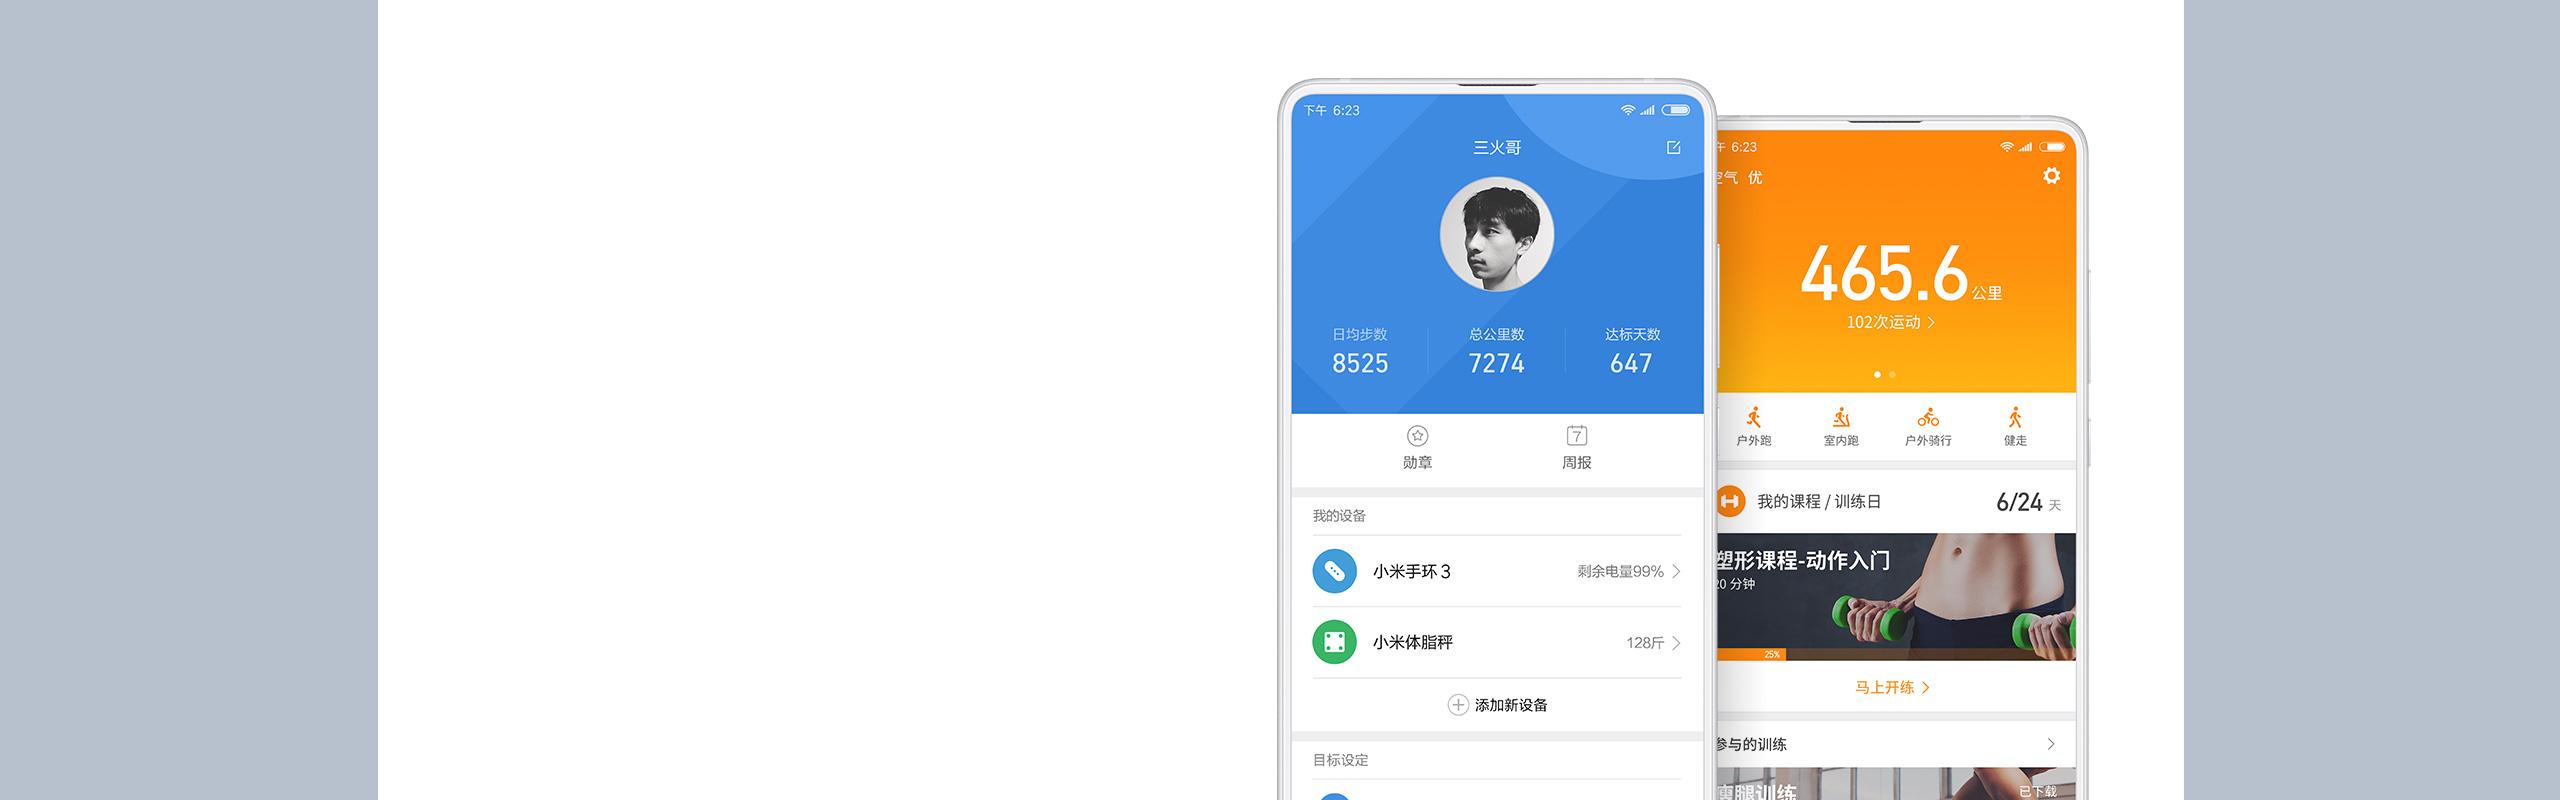 Xiaomi Mi Band 3 (Black) Global Version